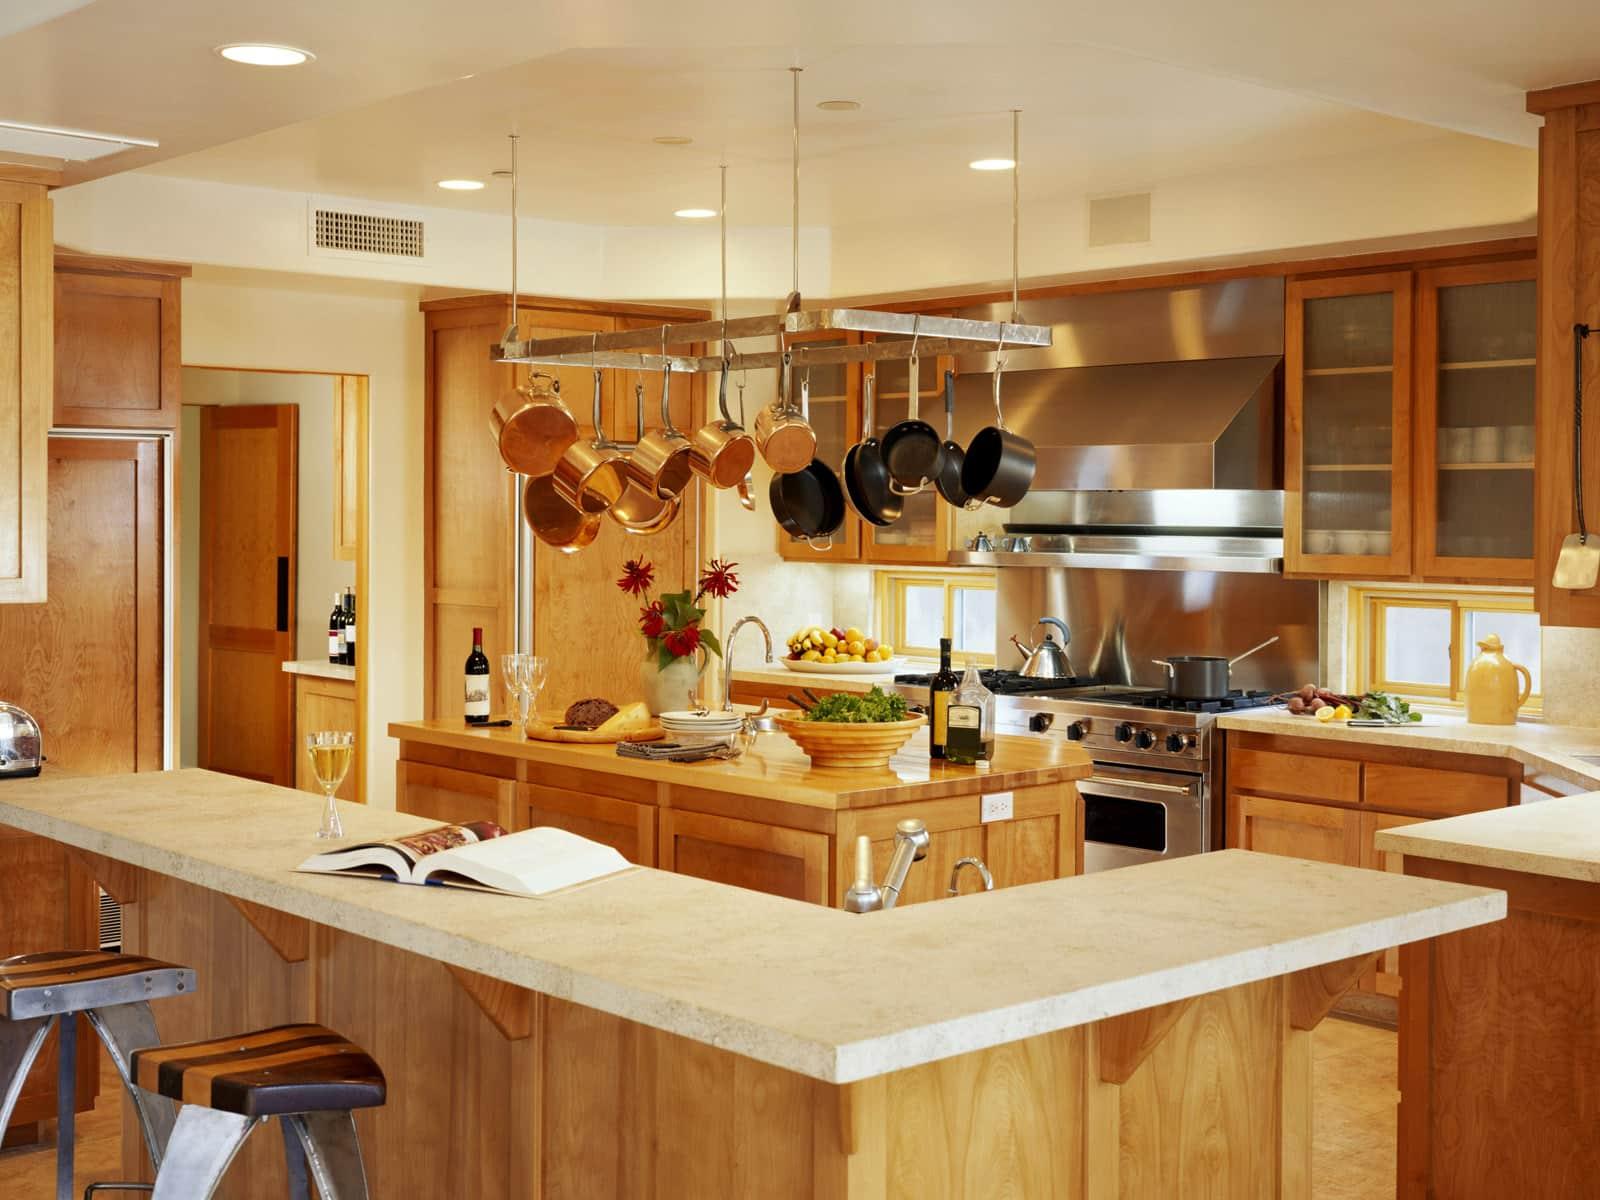 Home Design Kitchen Island Design Care House And Home   Kitchen home design. Interior Home Design Kitchen Amusing Home Design Kitchen 2 Home